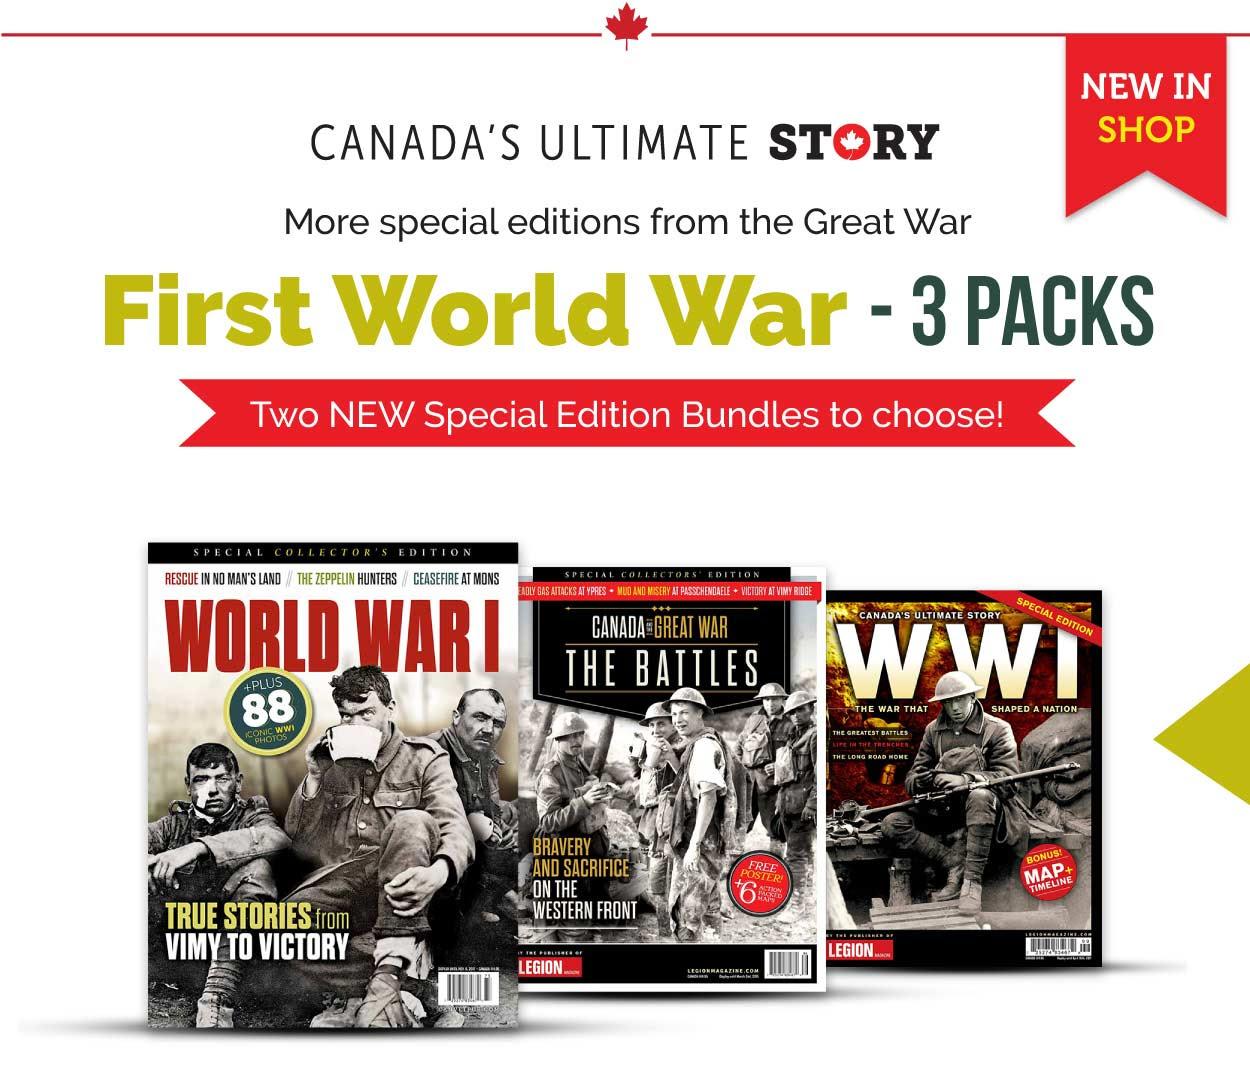 First World War 3 pack version 1